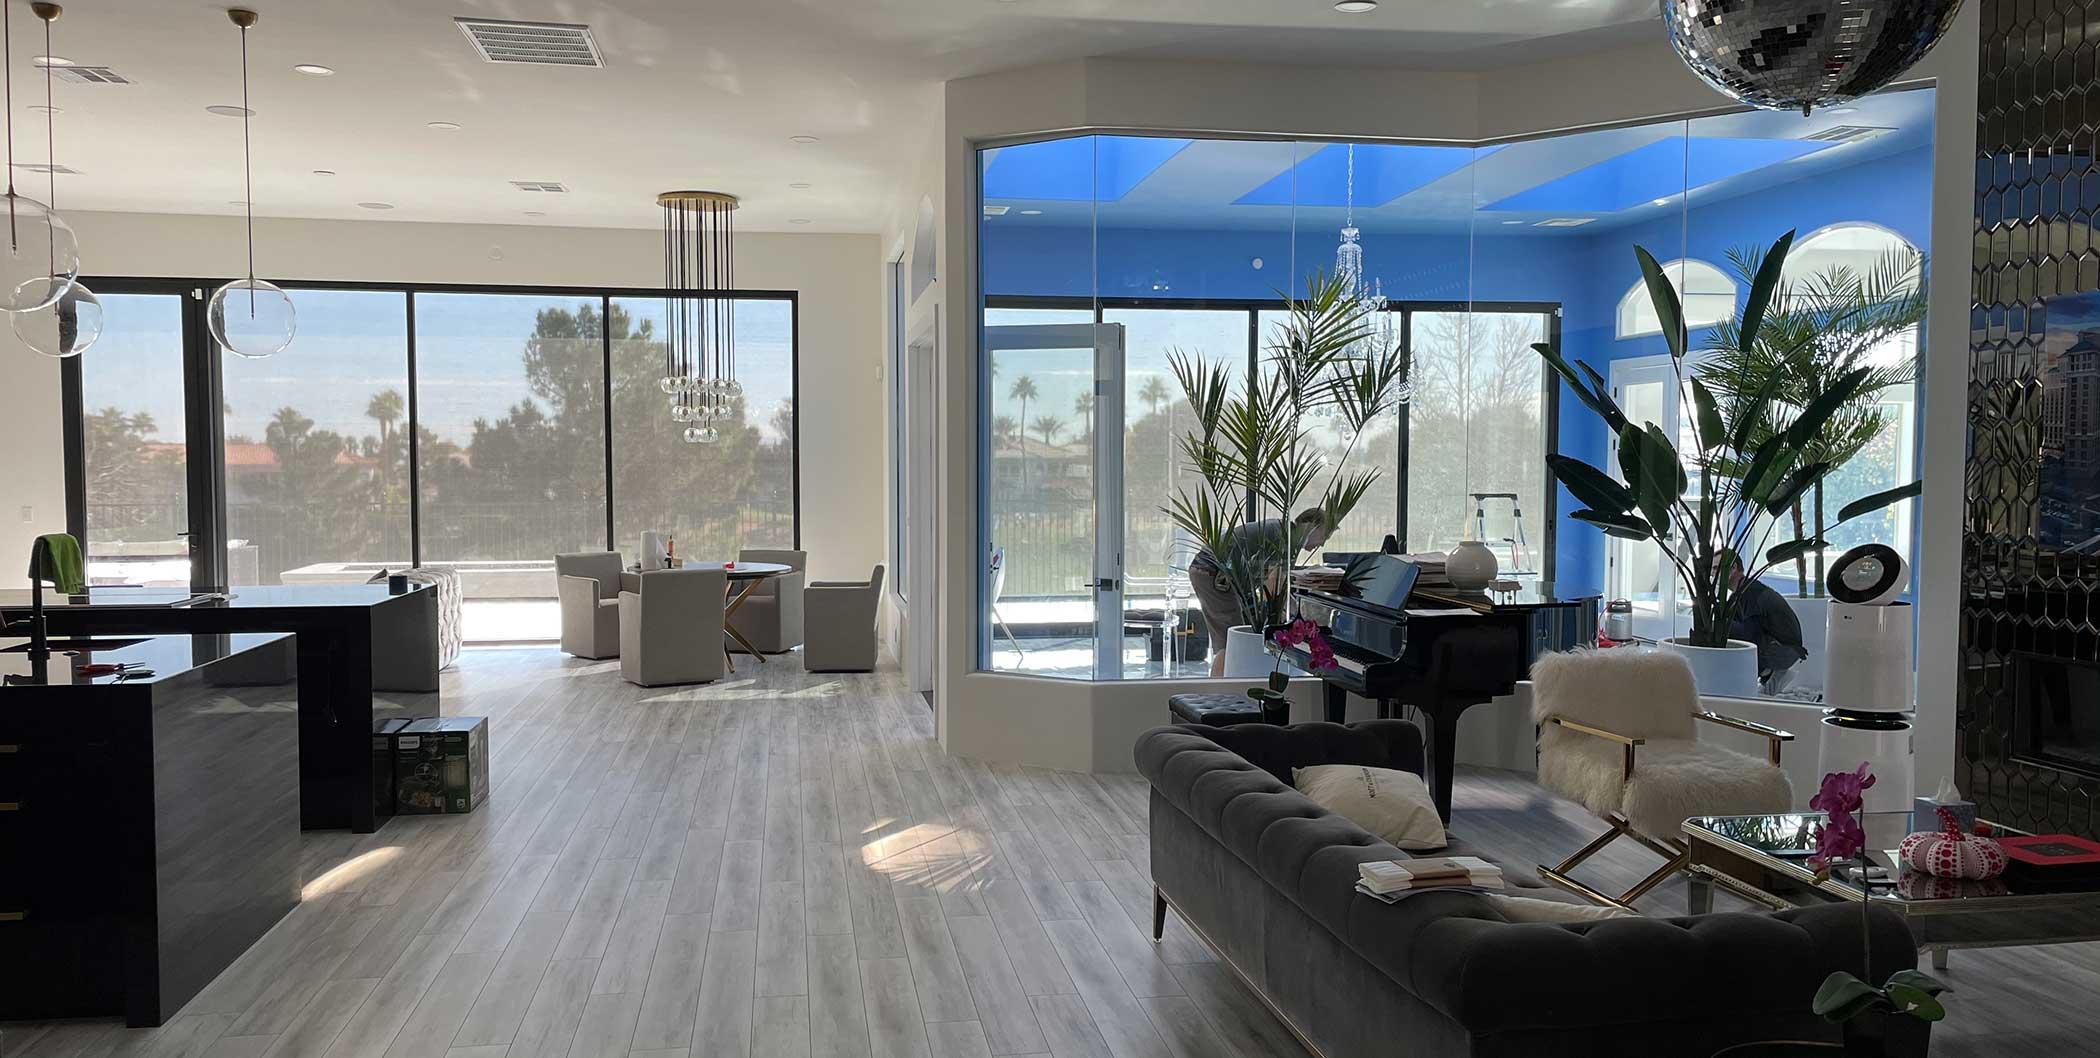 residential solar window tint